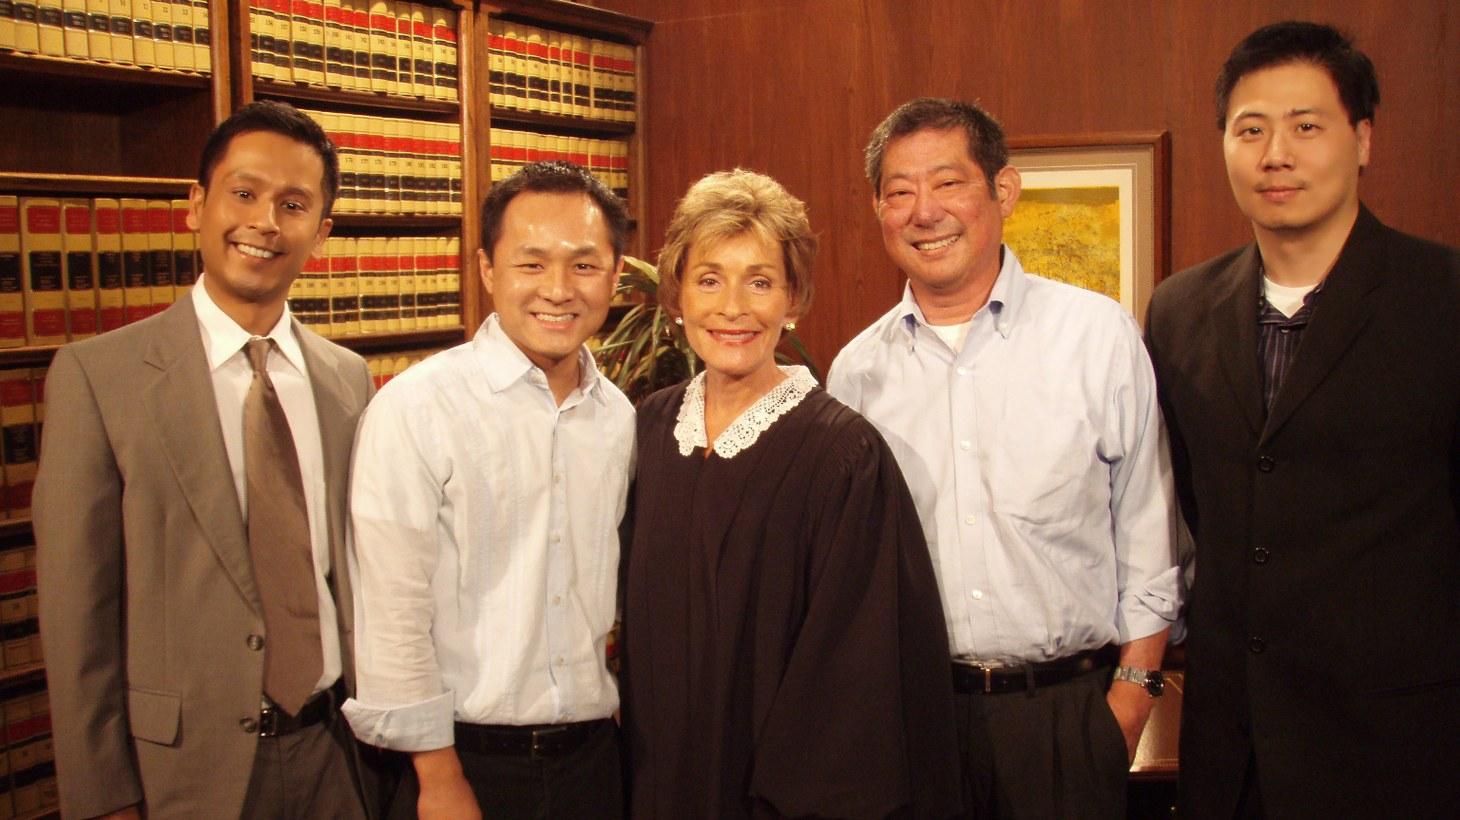 Judge Judy Sheindlin with fans.